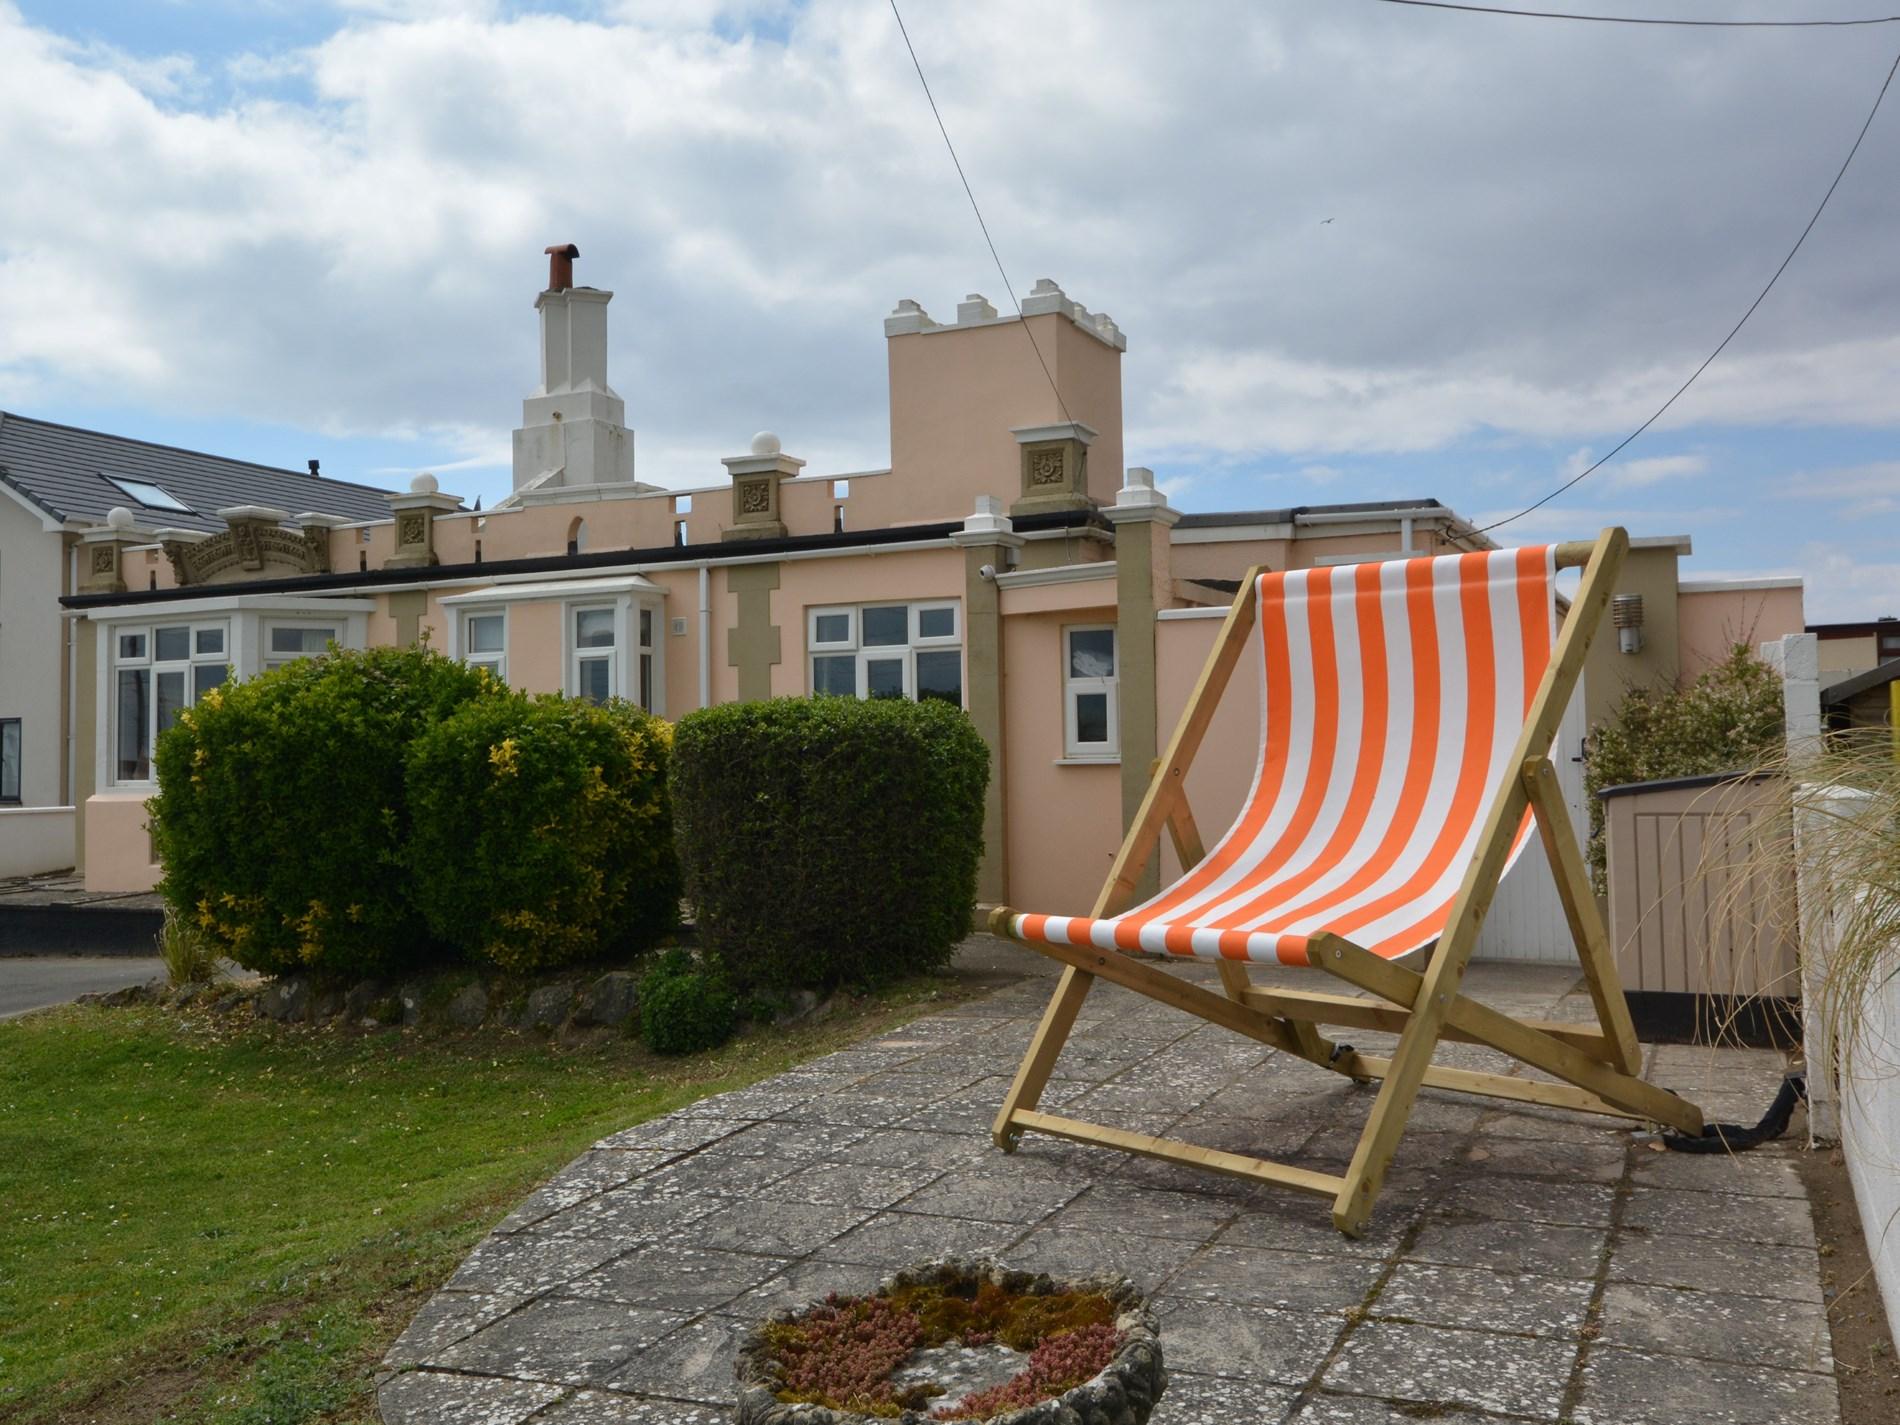 4 Bedroom Cottage in Burnham -on- Sea, Dorset and Somerset